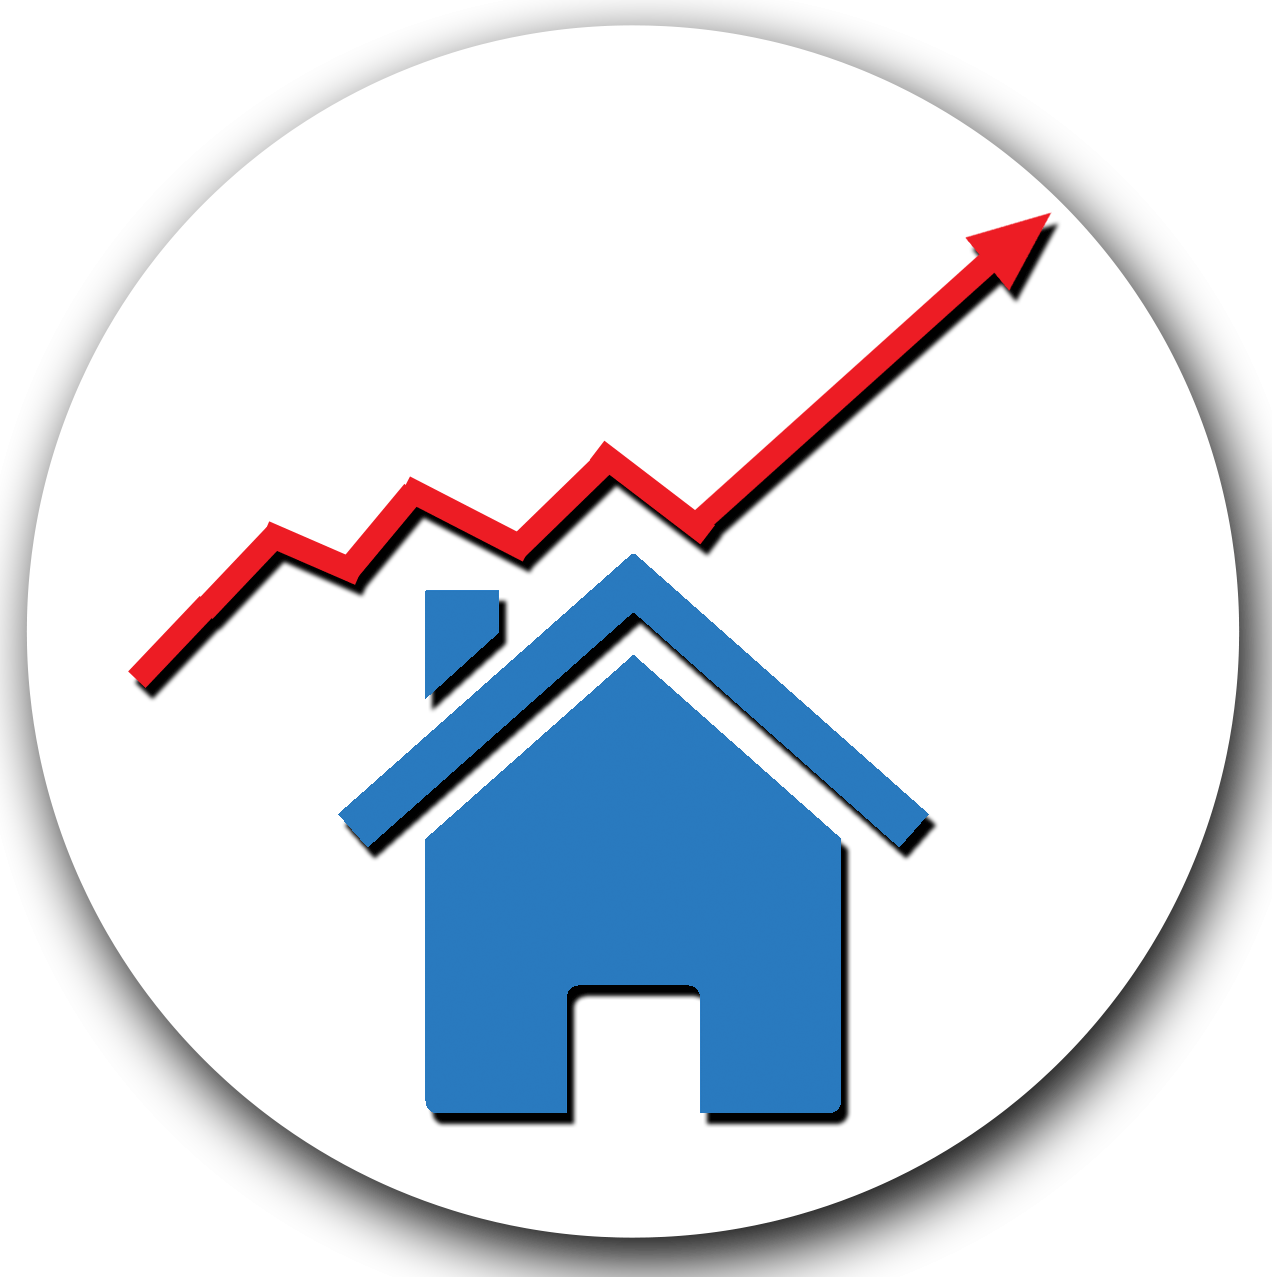 Deltona Housing Boom